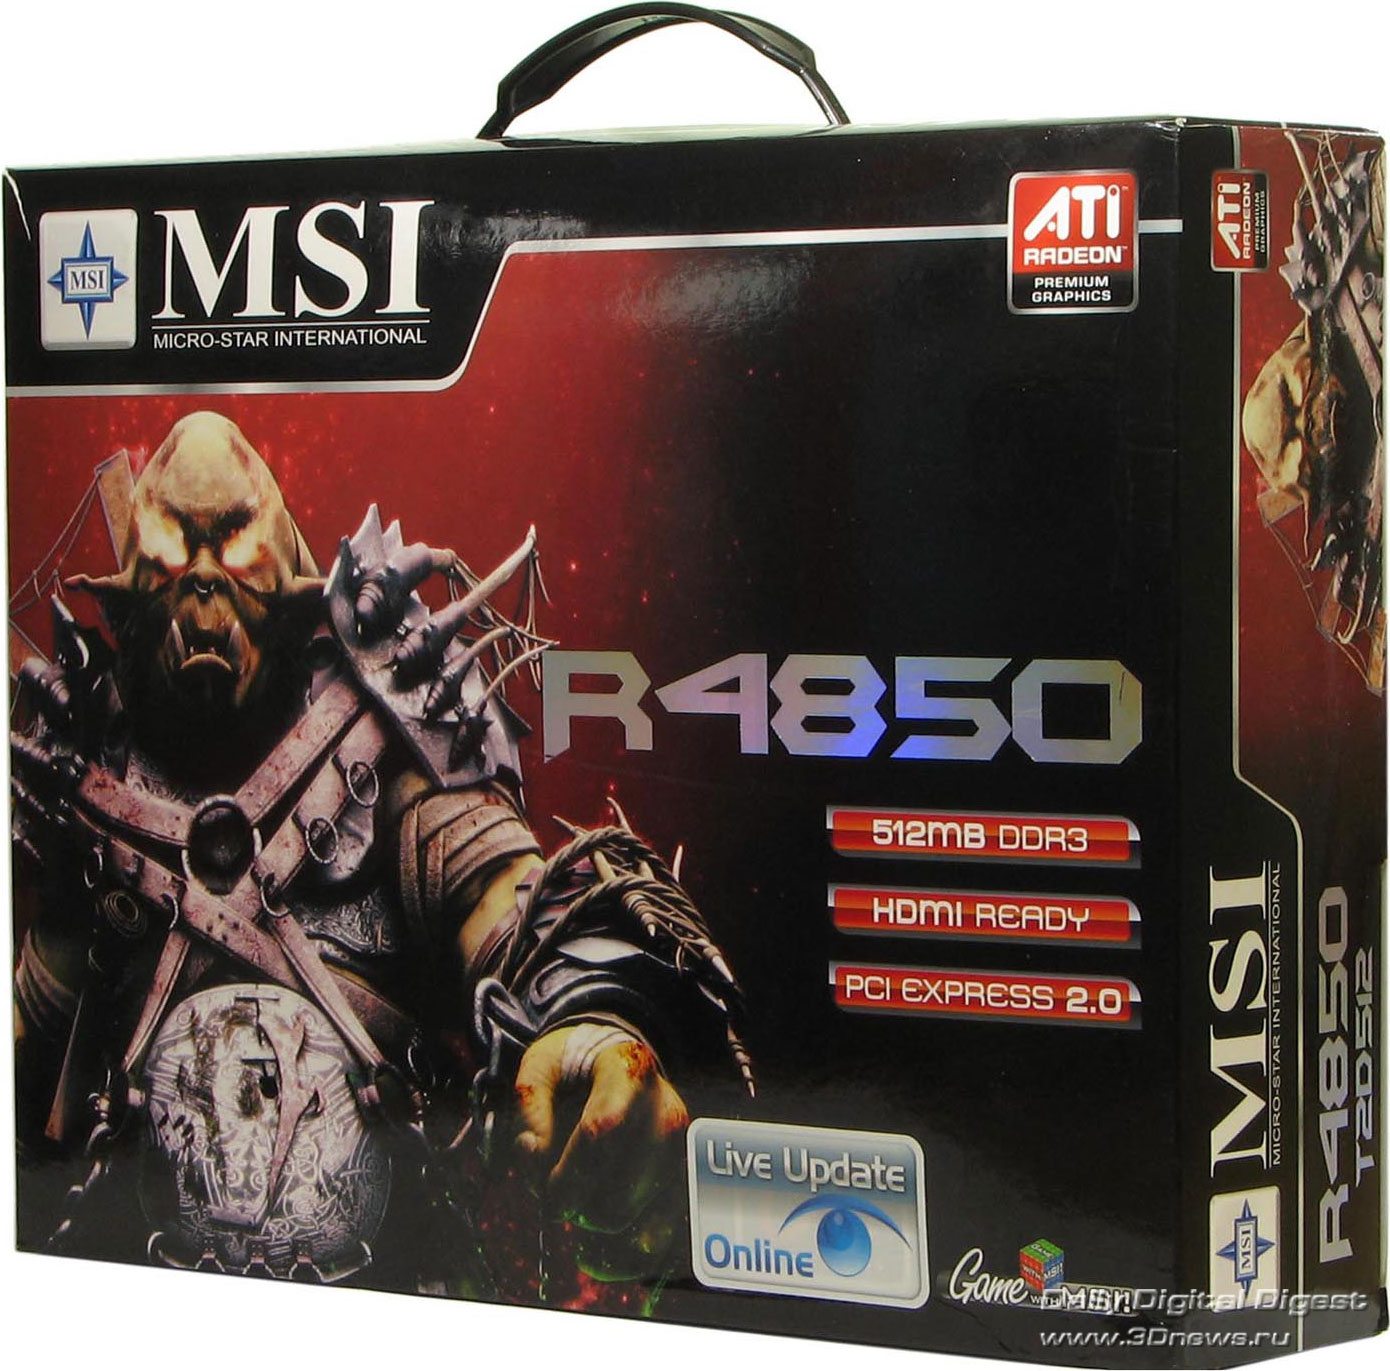 MSI Radeon HD 4850 - на пути к Radeon HD4870 / Видеокарты: http://www.3dnews.ru/565317